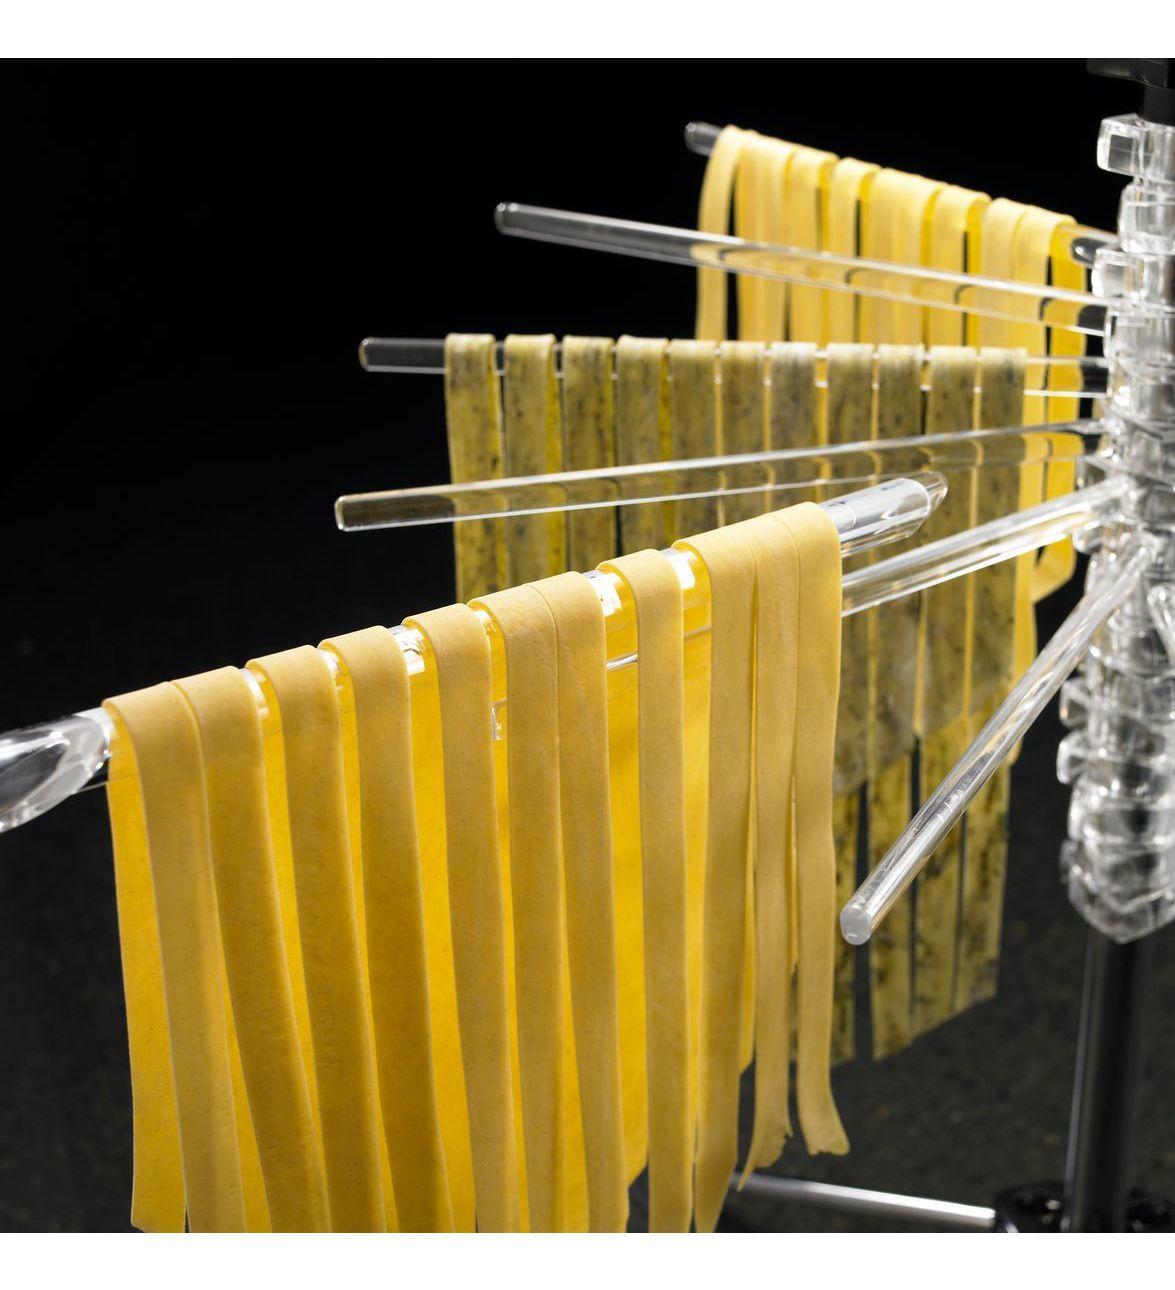 Pasta drying rack pasta drying rack kitchen countertop